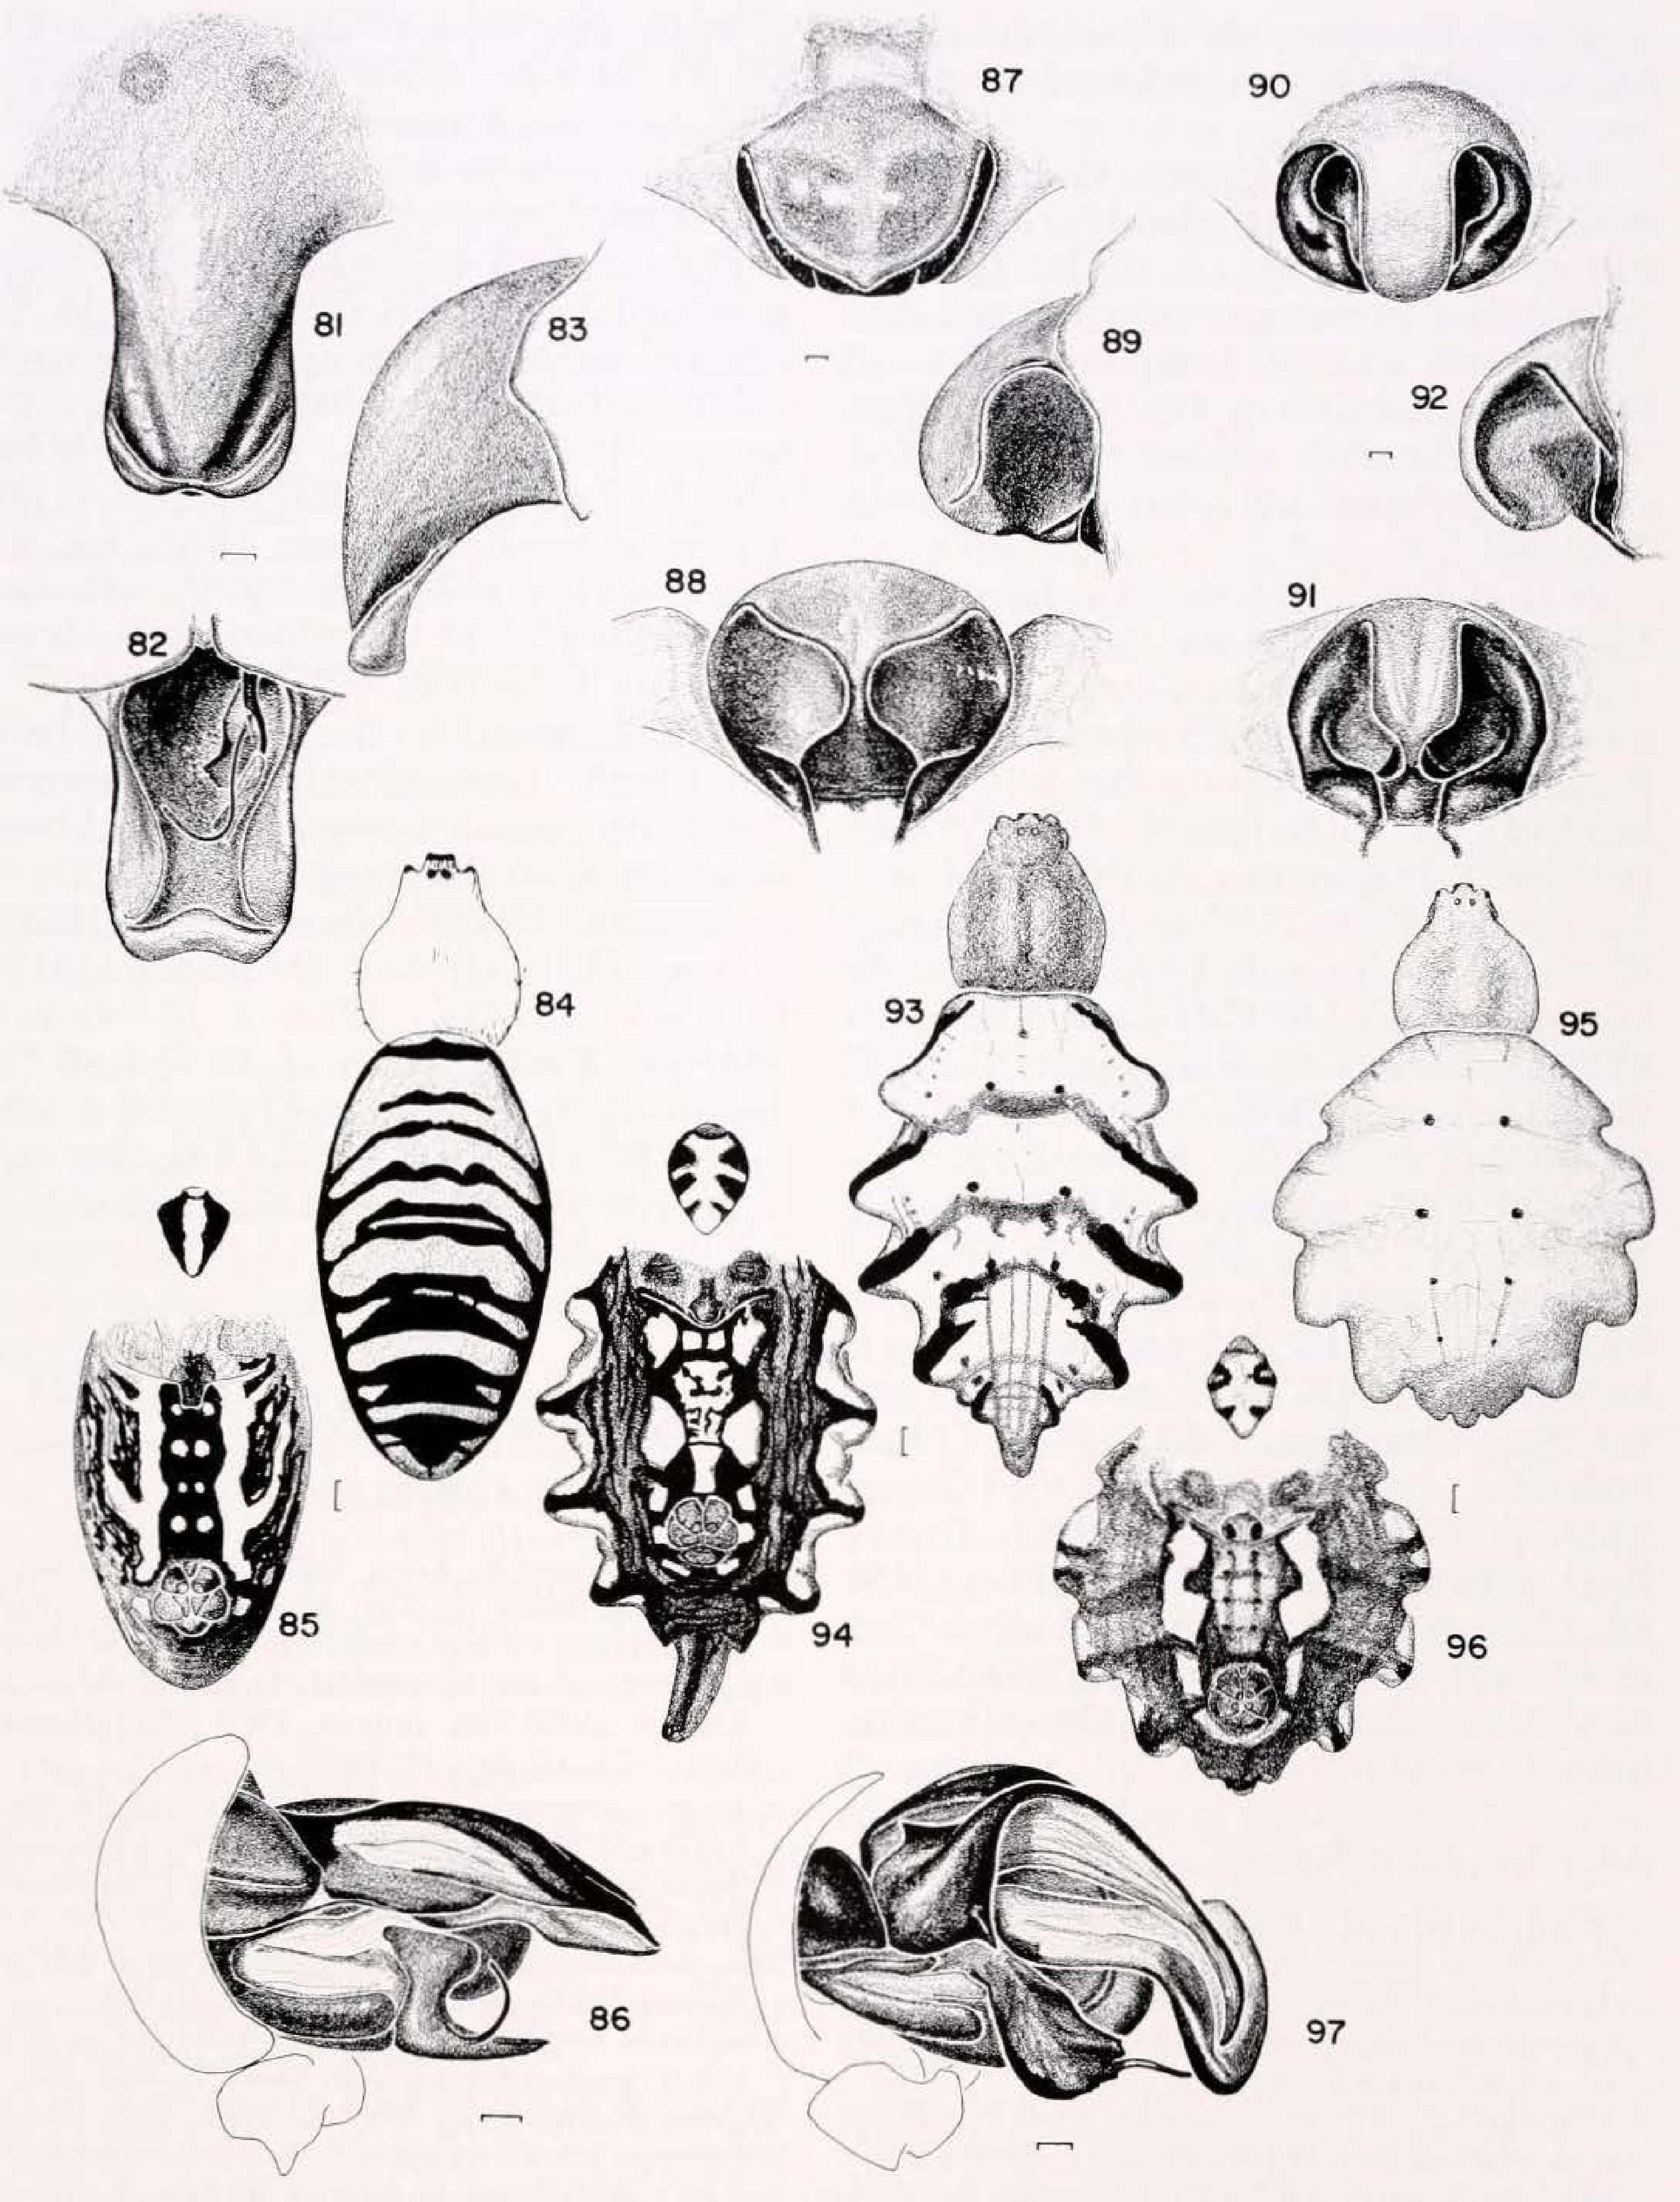 figure 81-86